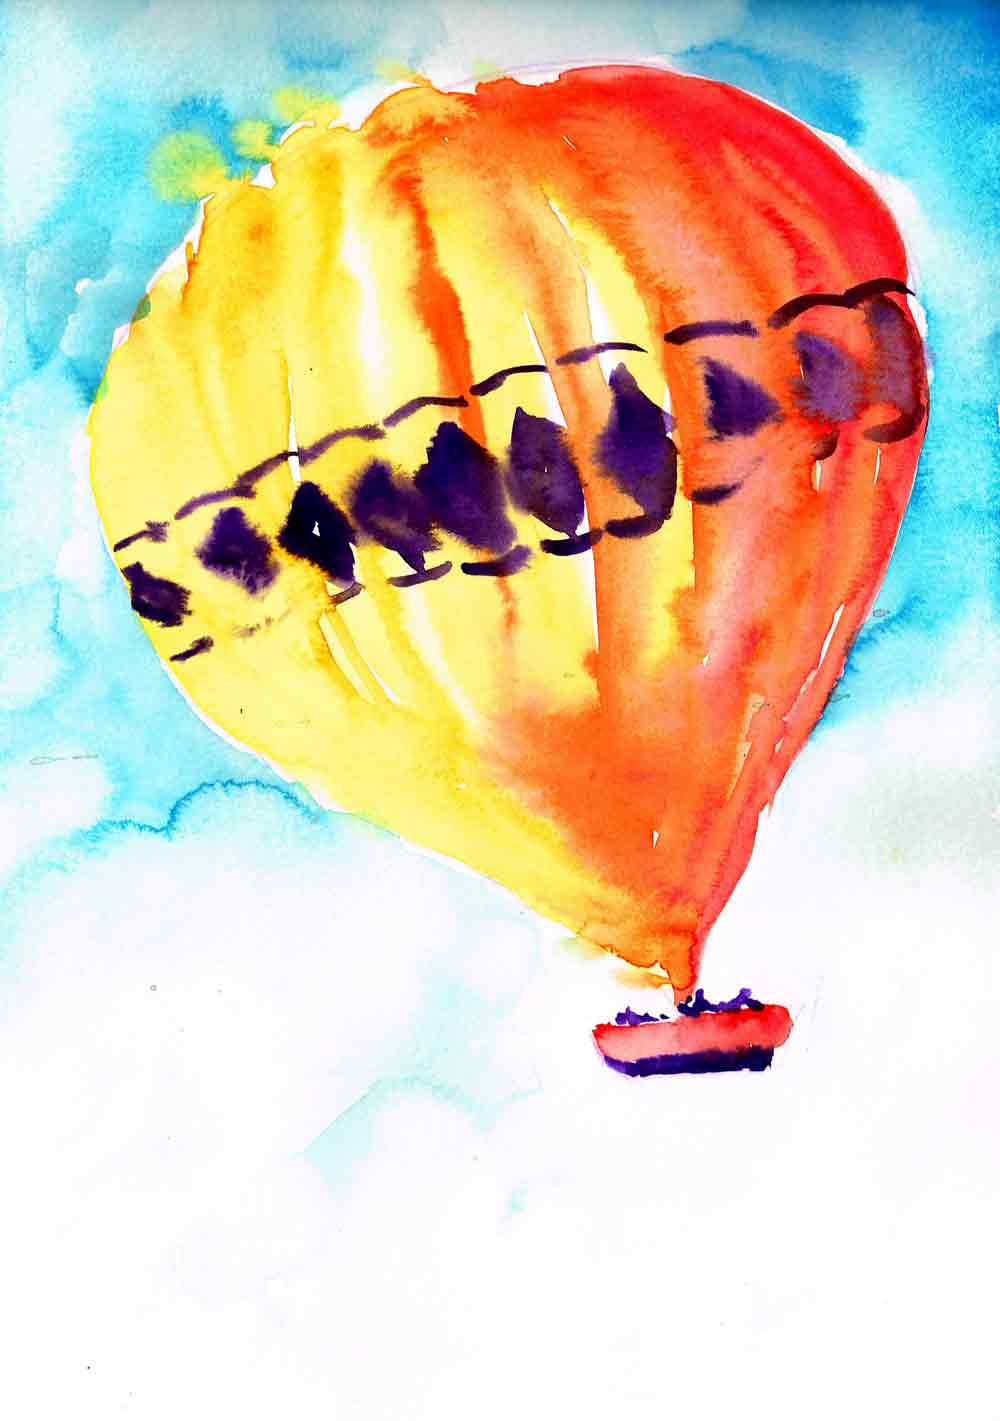 balloon-in-the-sky-sketchbook-kw.jpg